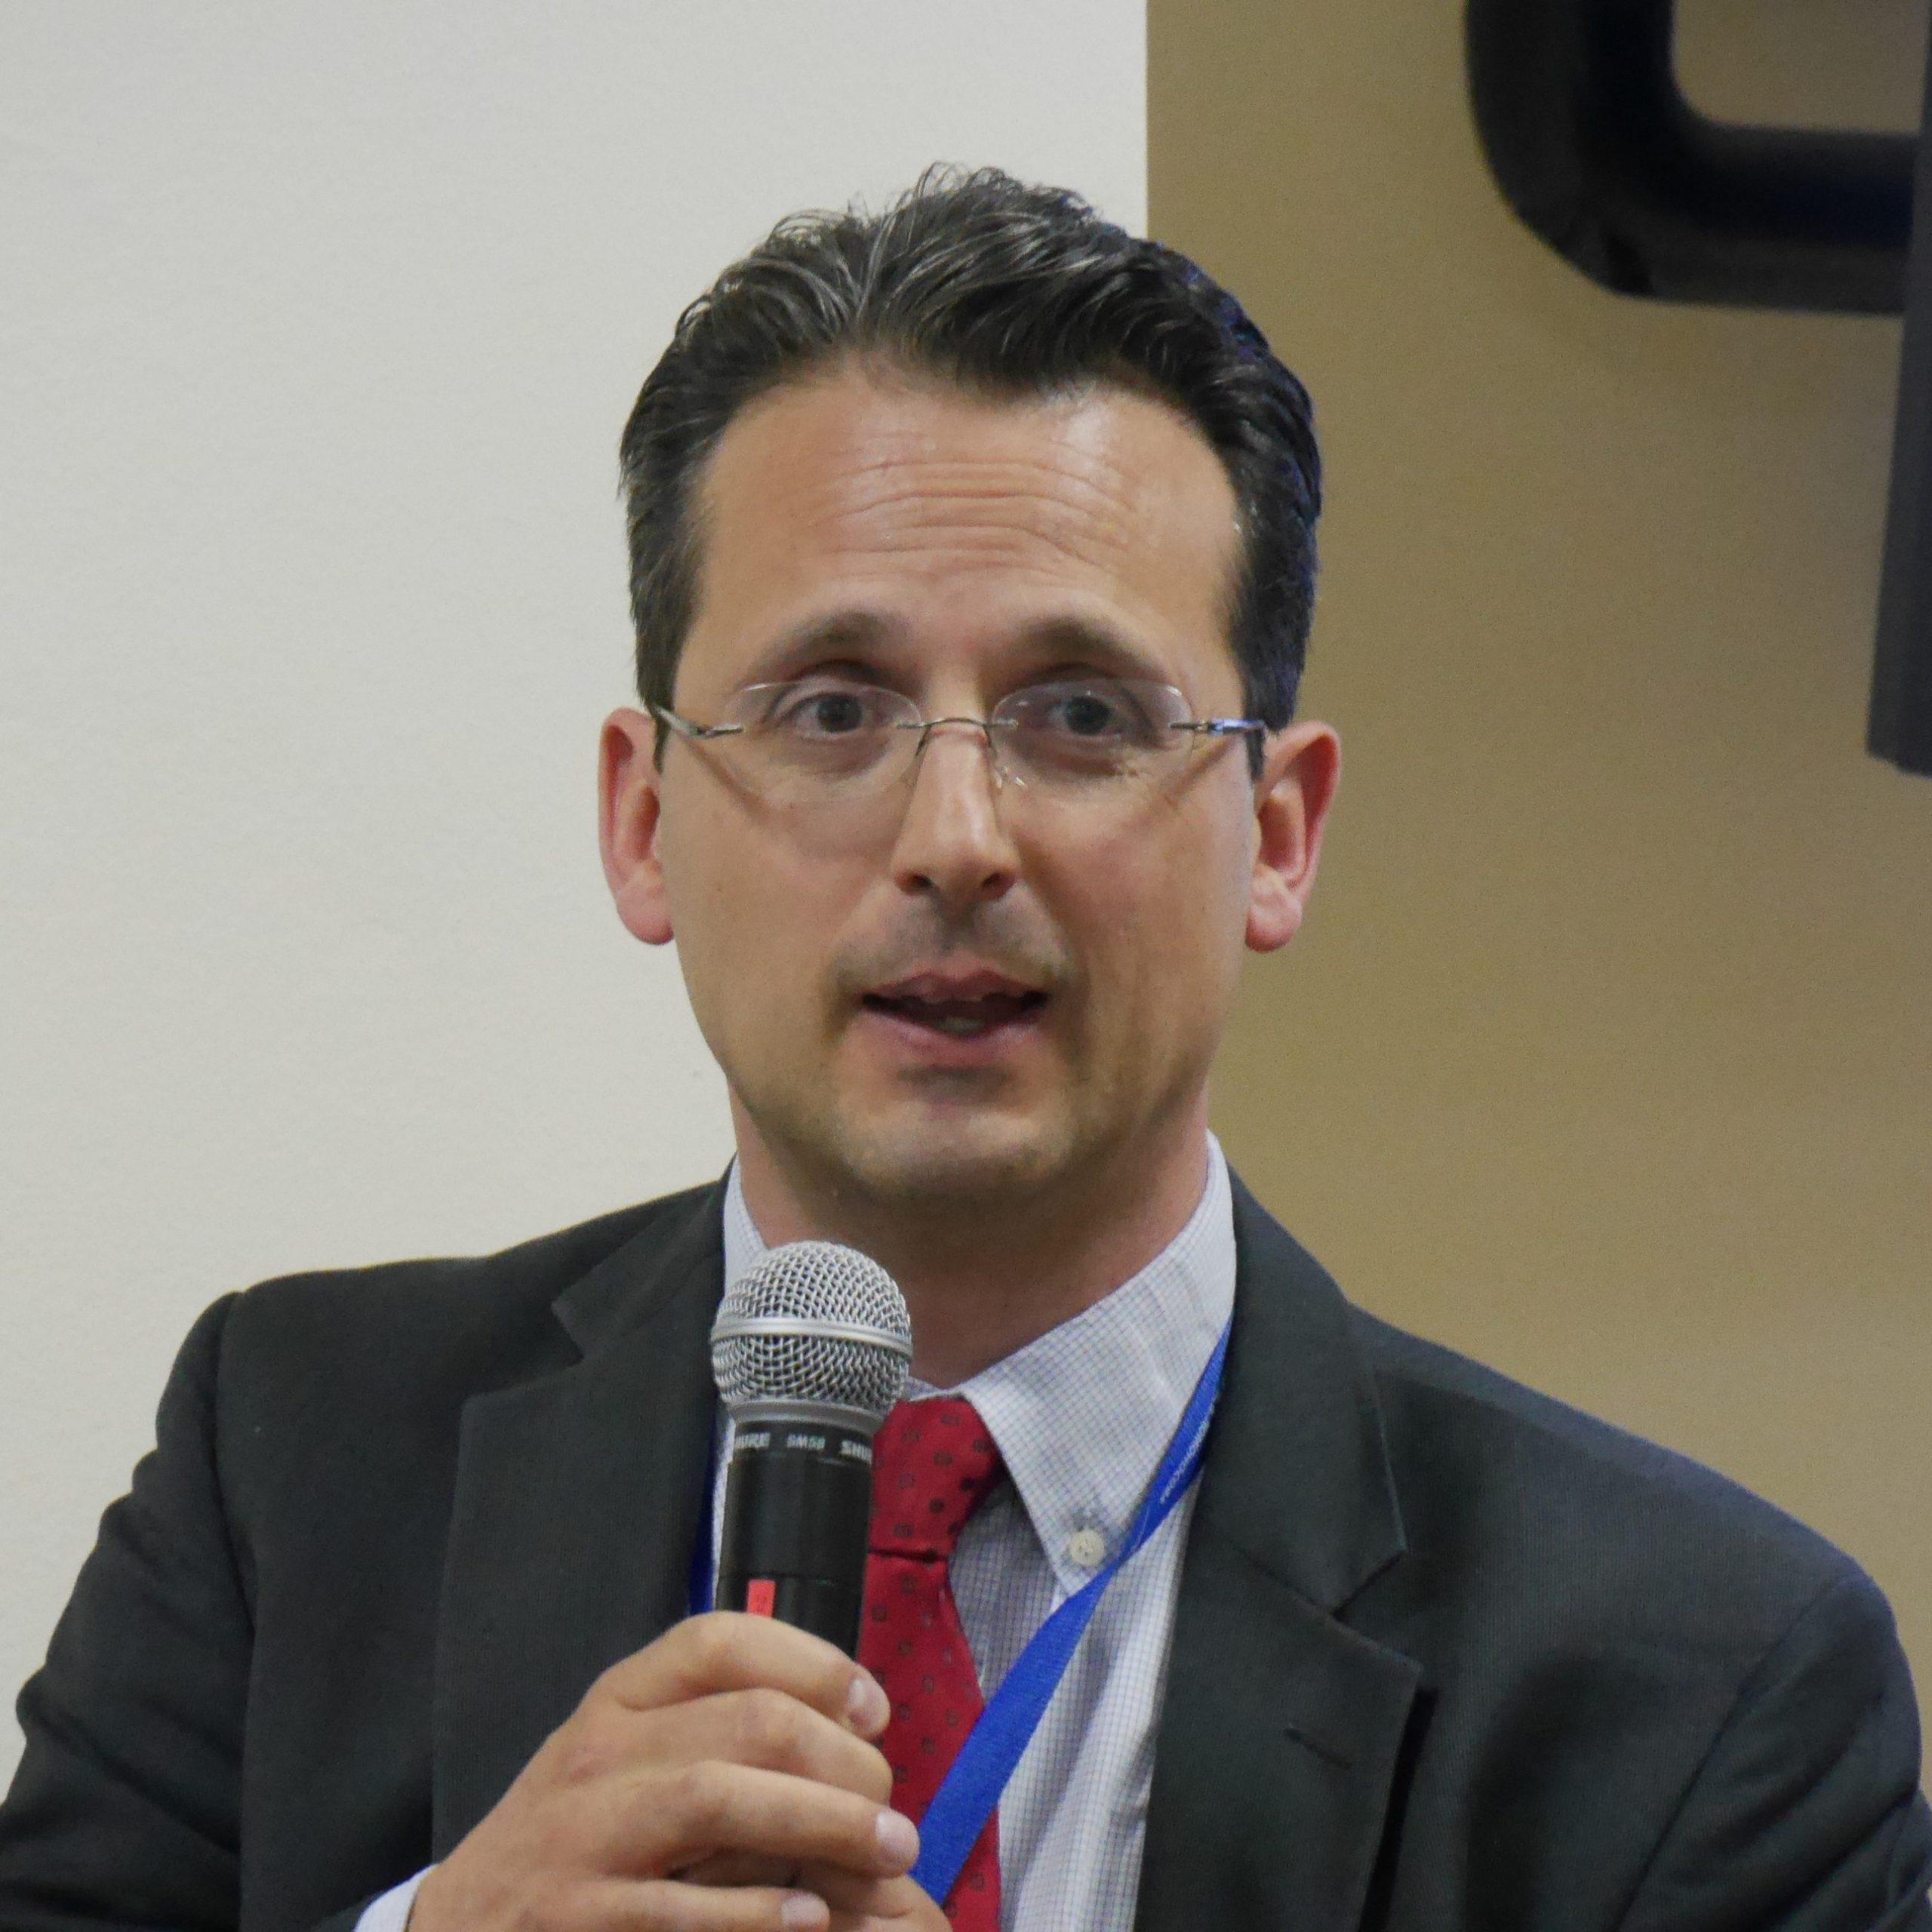 Profile picture of Bart Defrancq